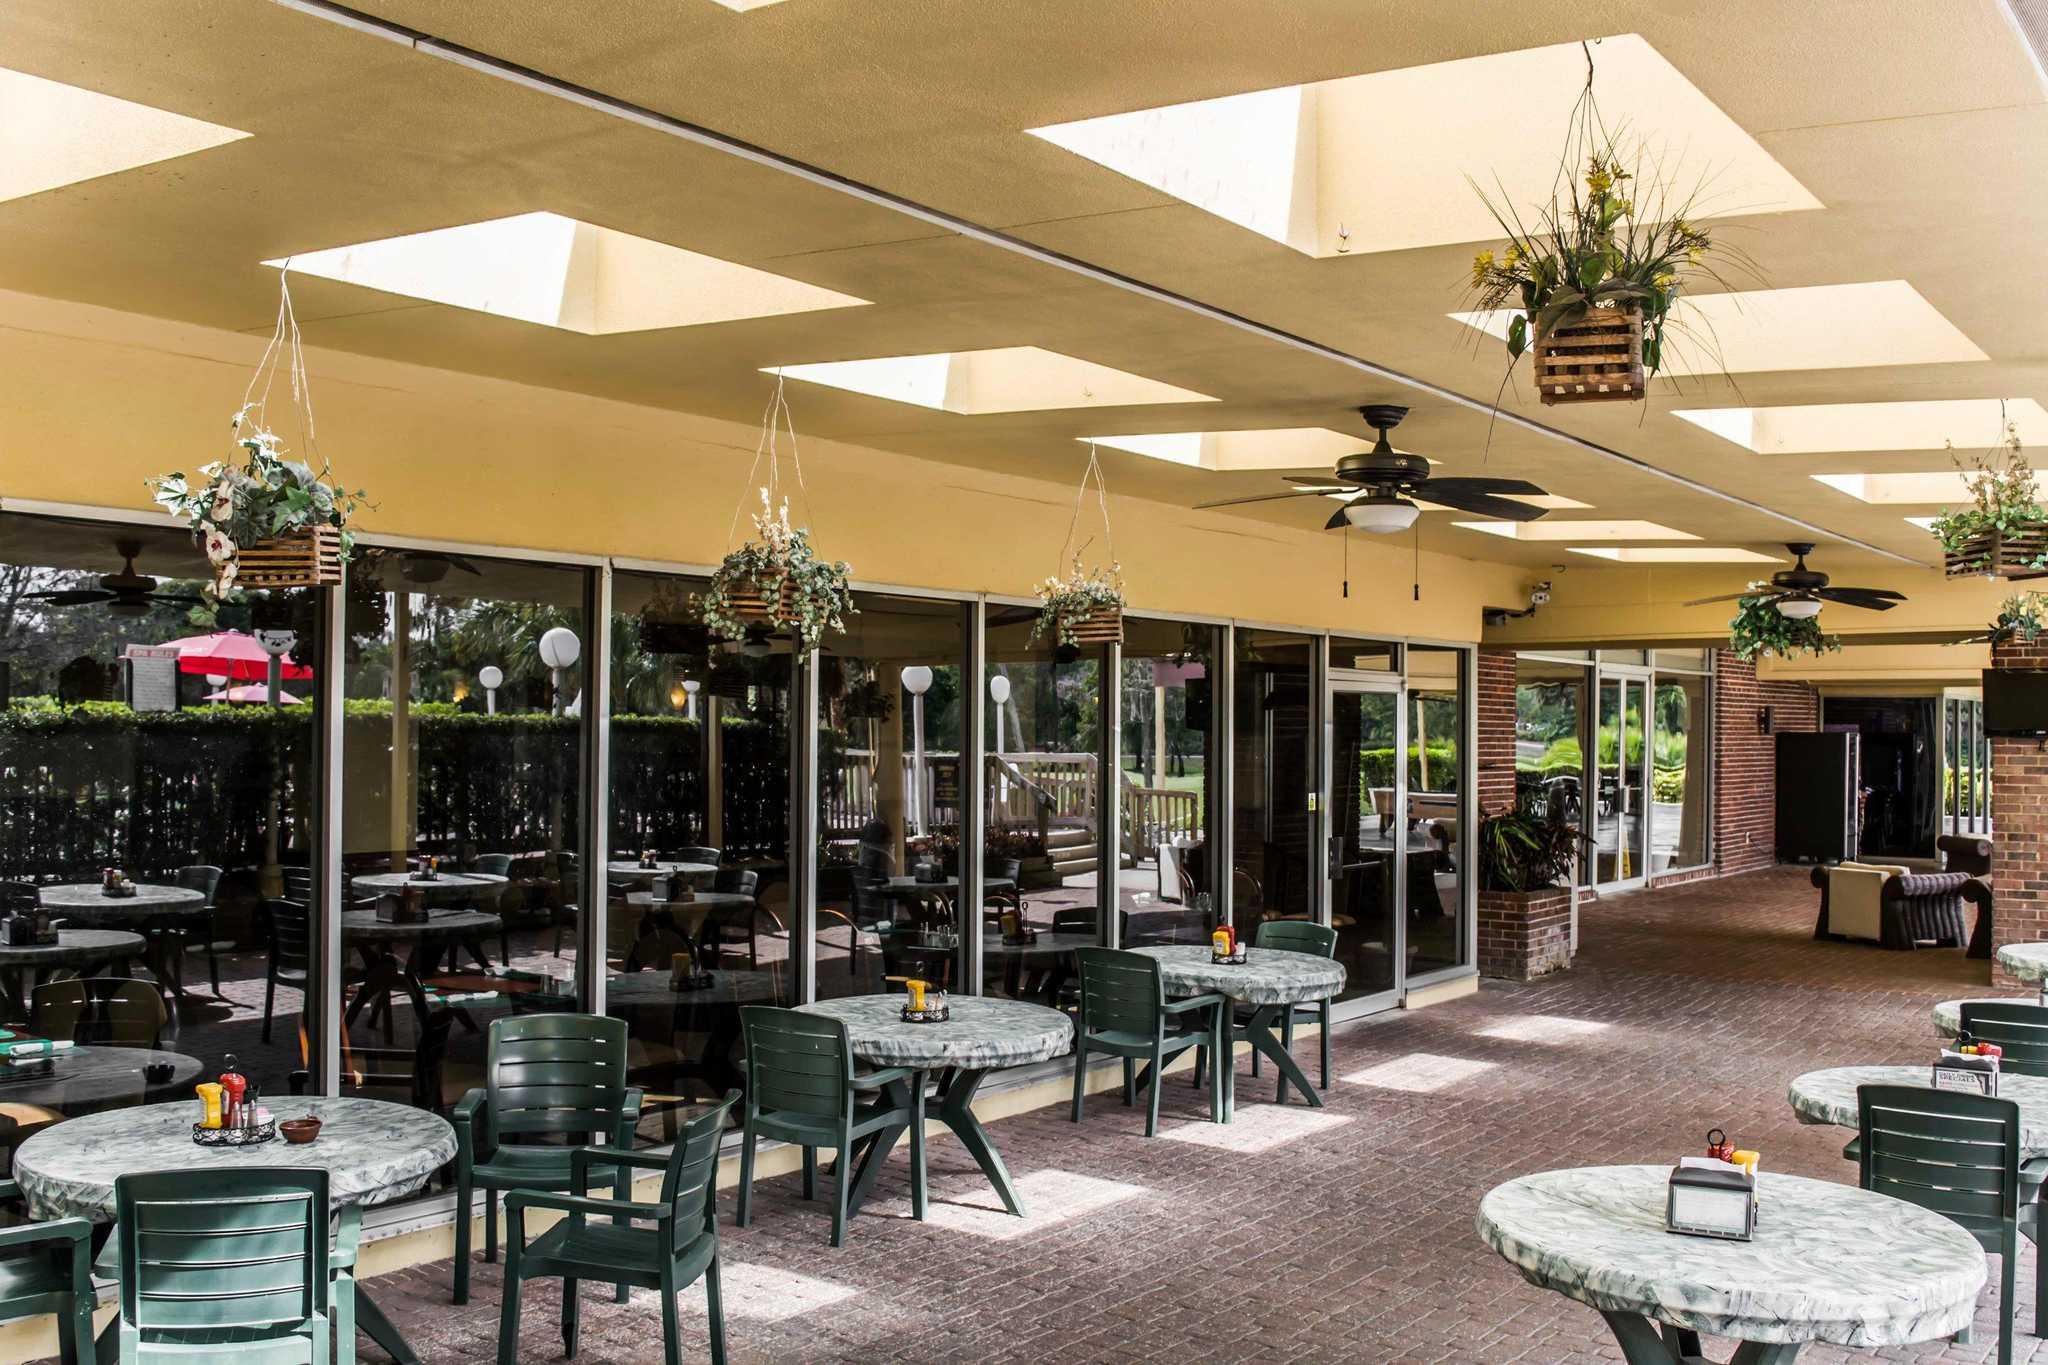 Quality Inn & Suites Golf Resort image 21